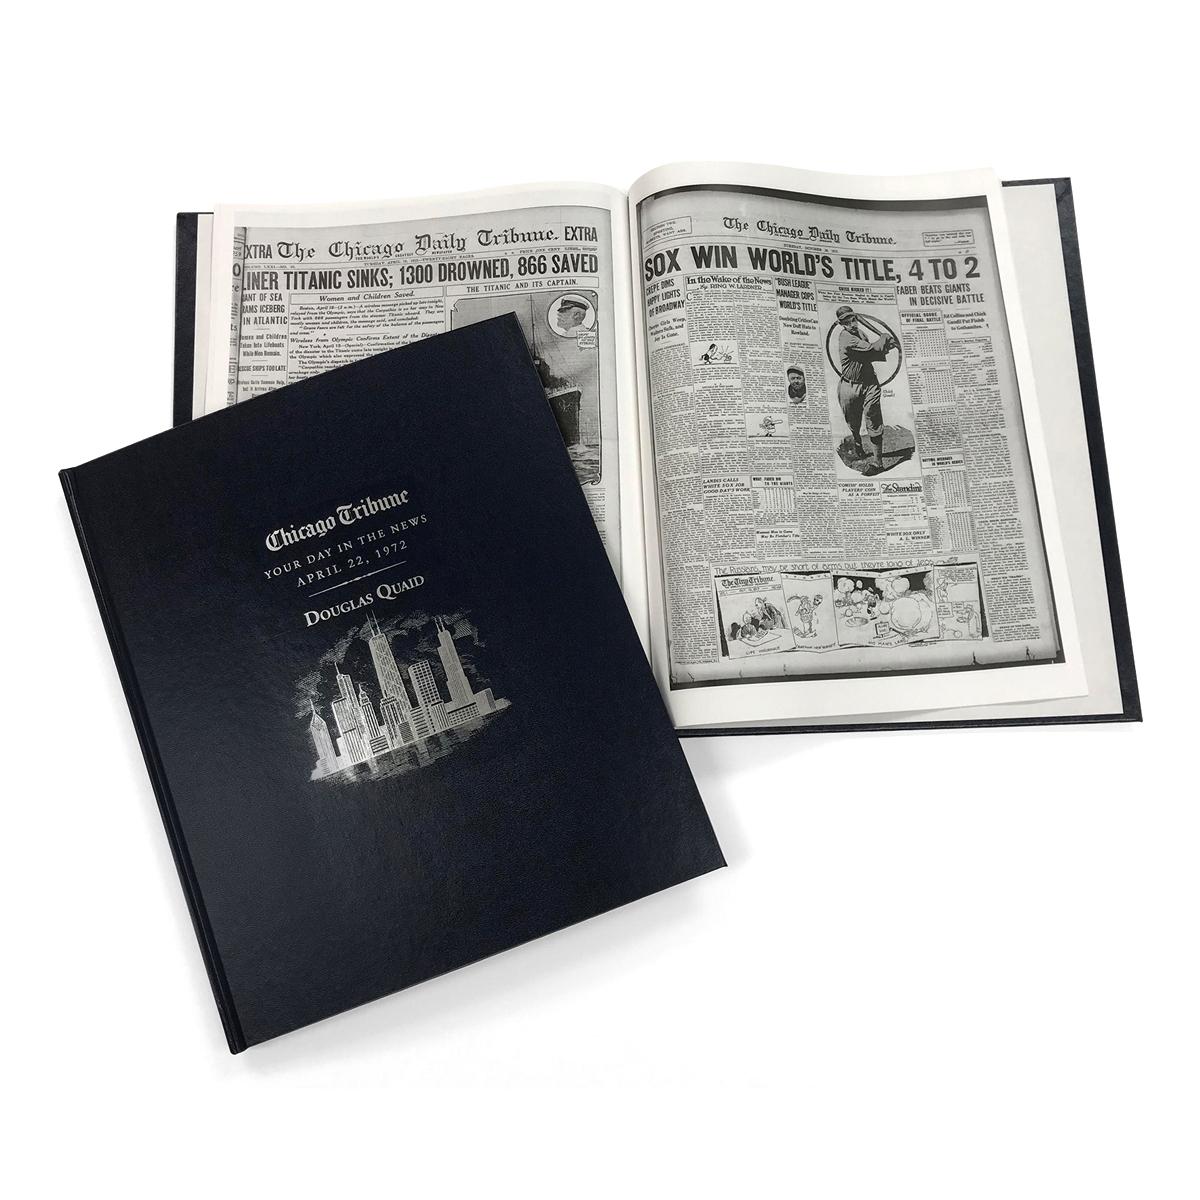 Chicago Tribune Birthday Book